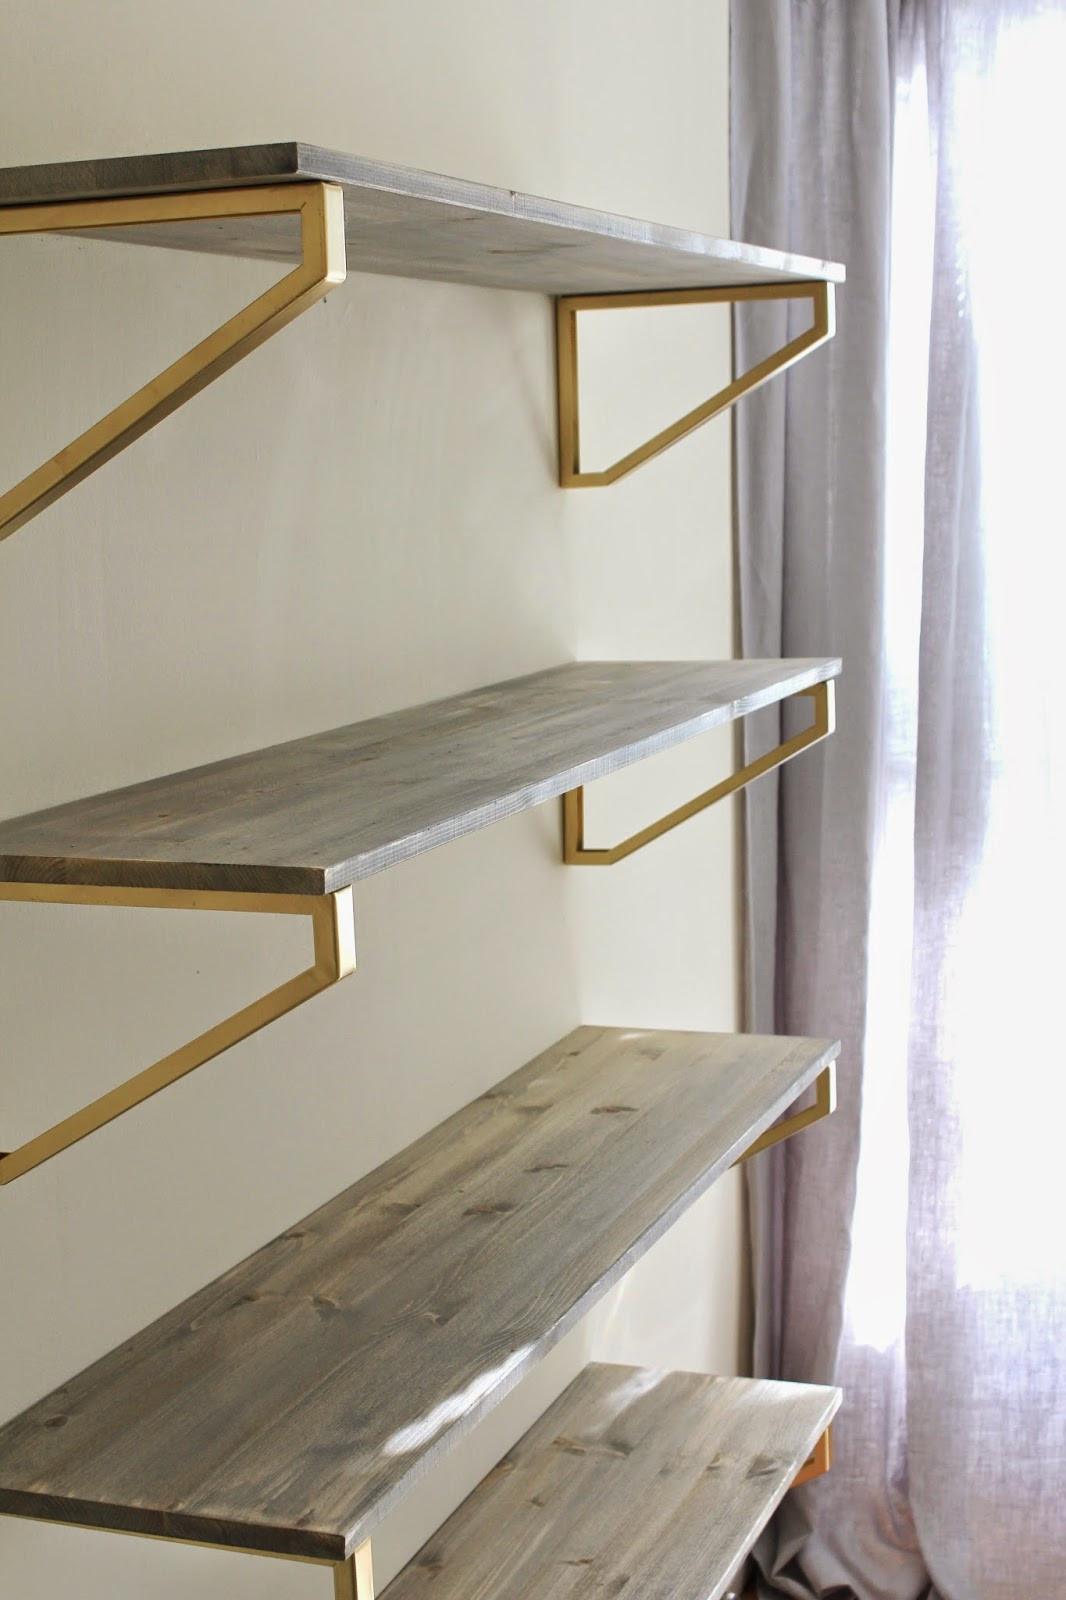 Best ideas about DIY Wood Shelf Bracket . Save or Pin Cup Half Full Rustic Wood Shelf DIY Now.